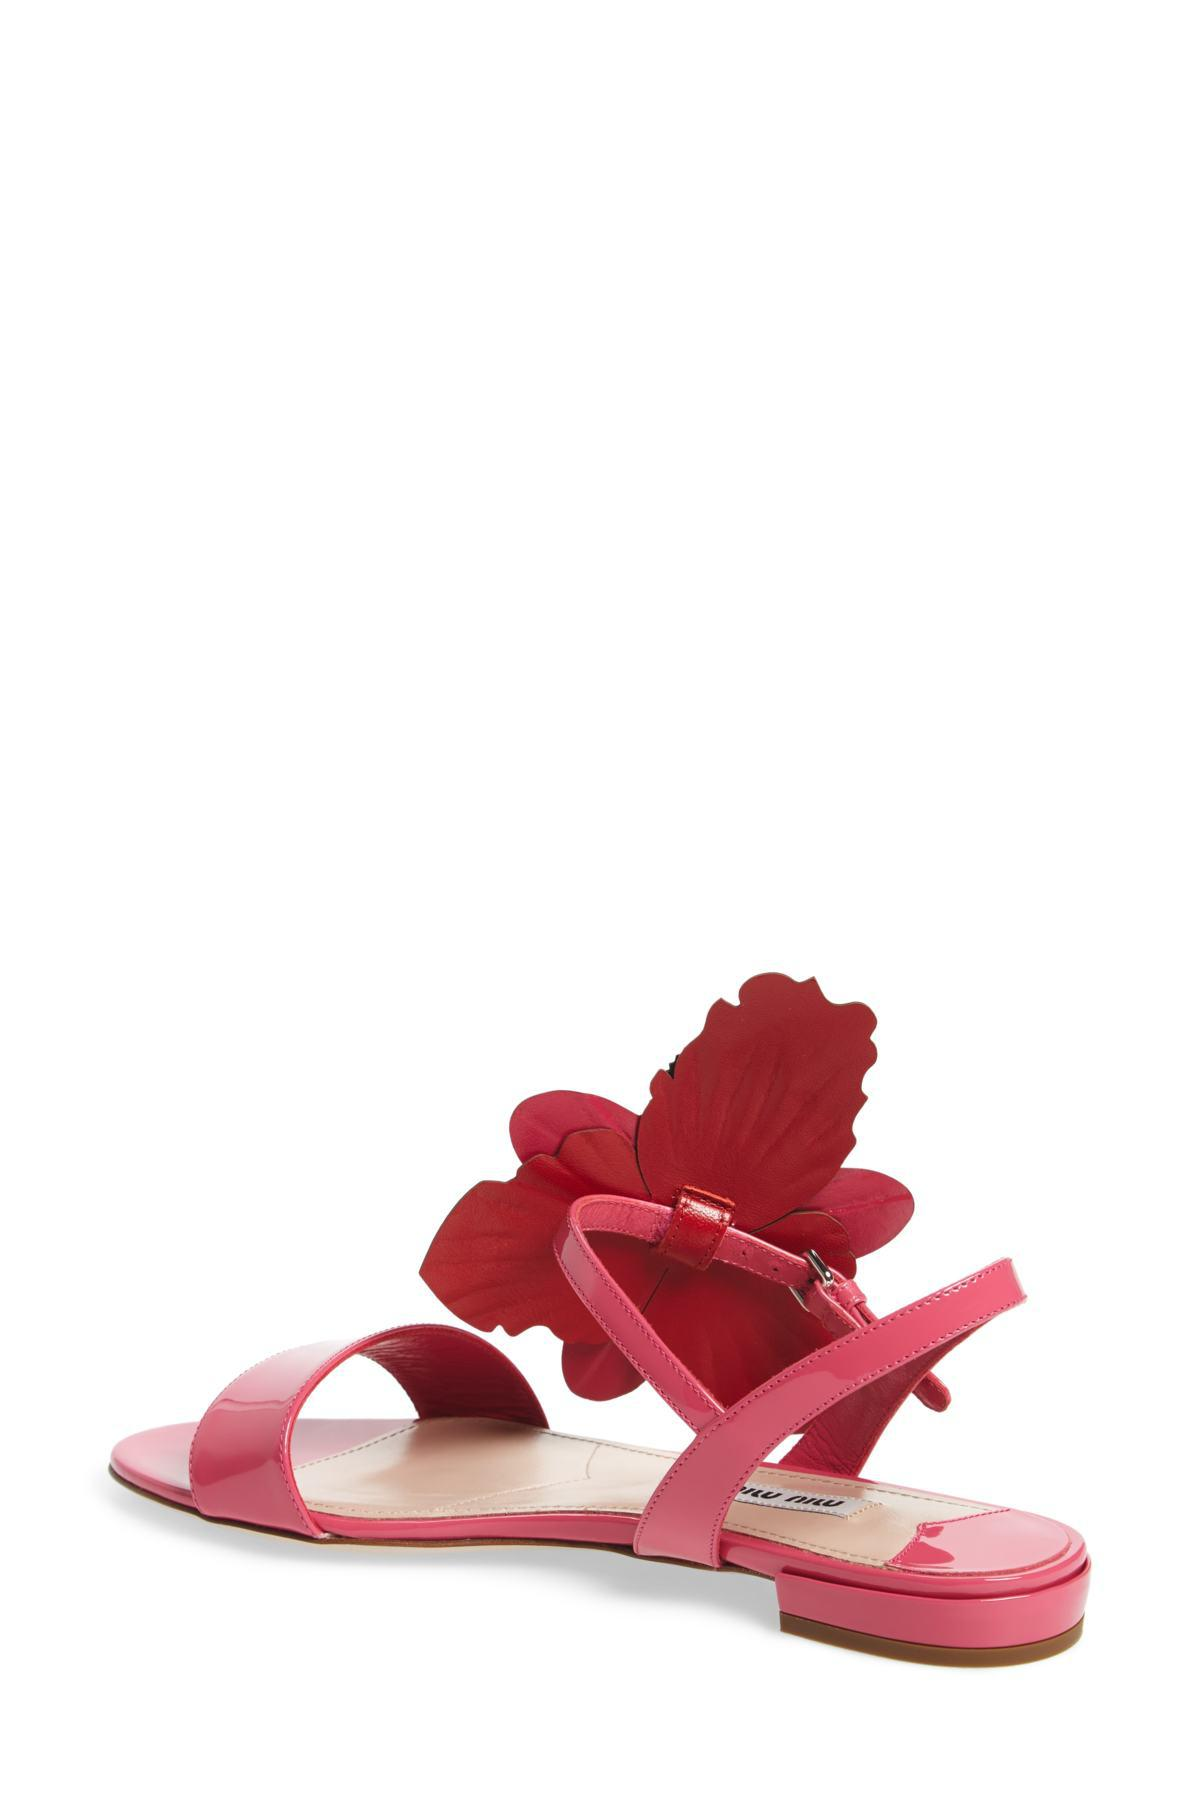 check out 0e8ea 54b5c miu-miu-F0K9Z-PEONIA-ROSSO-Flower-Applique-Flat-Sandal.jpeg